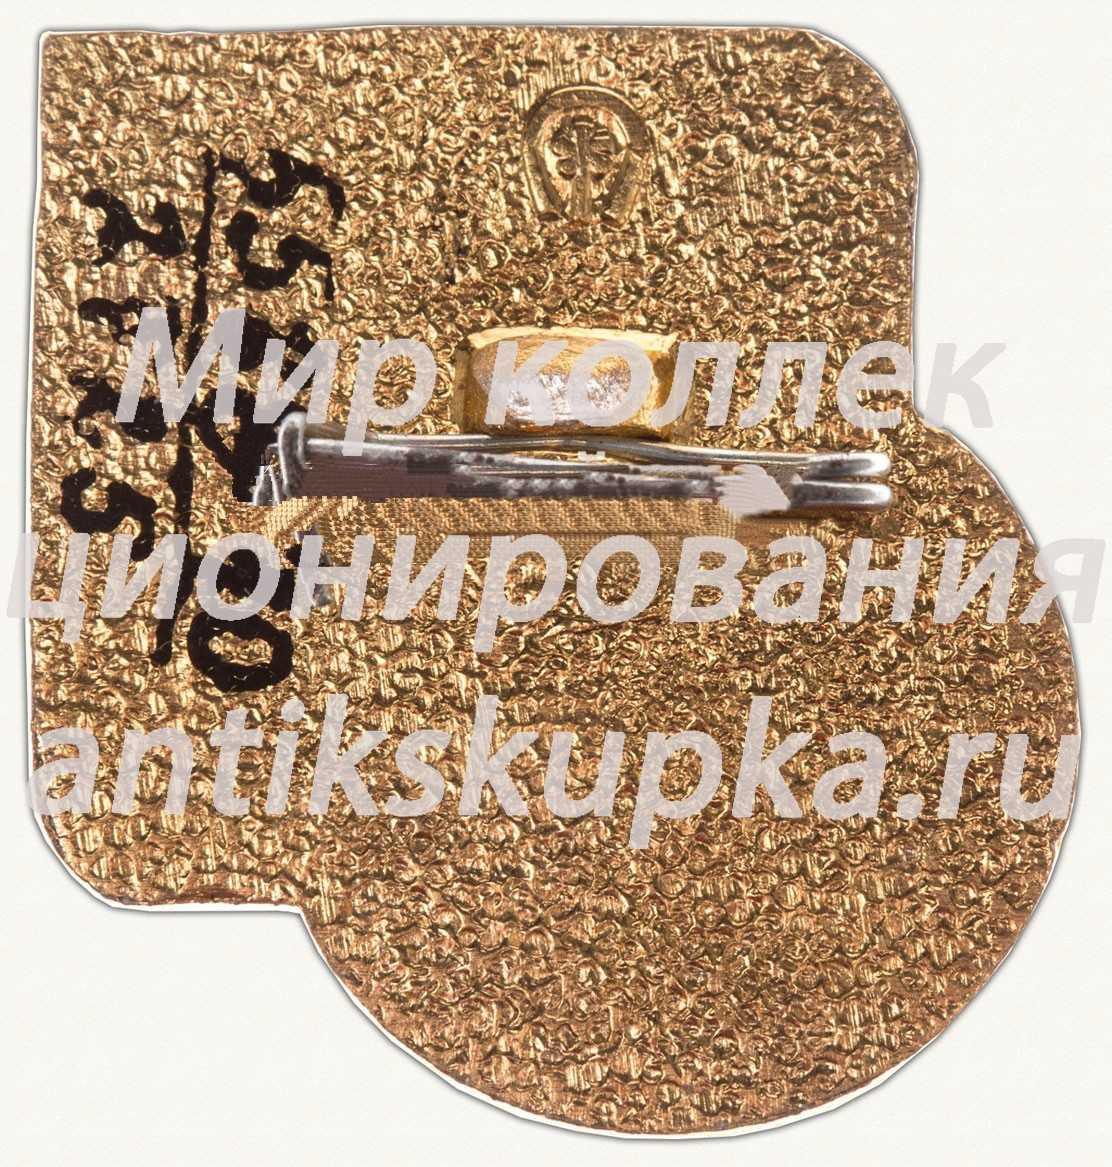 Знак участника съезда малочисоенных народов севера. Москва. 1990